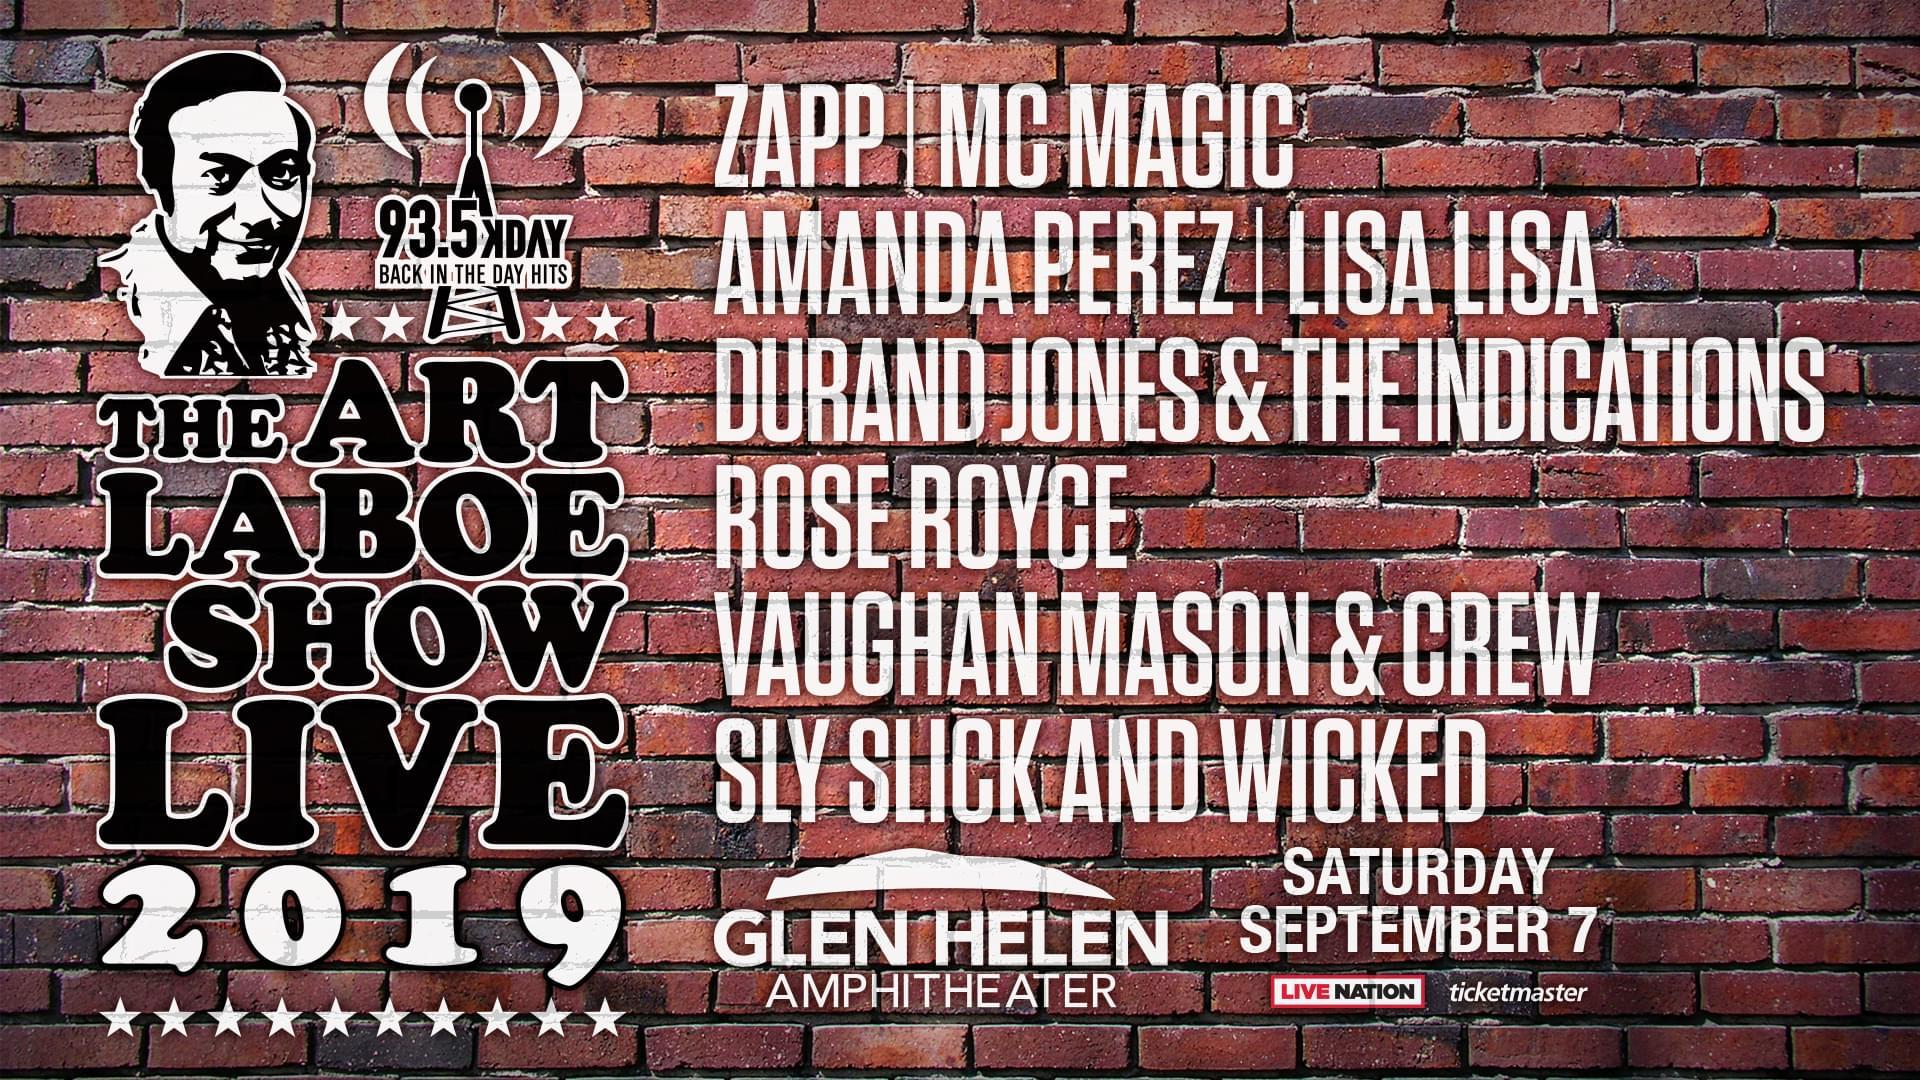 The Art Laboe Show Live | 2019